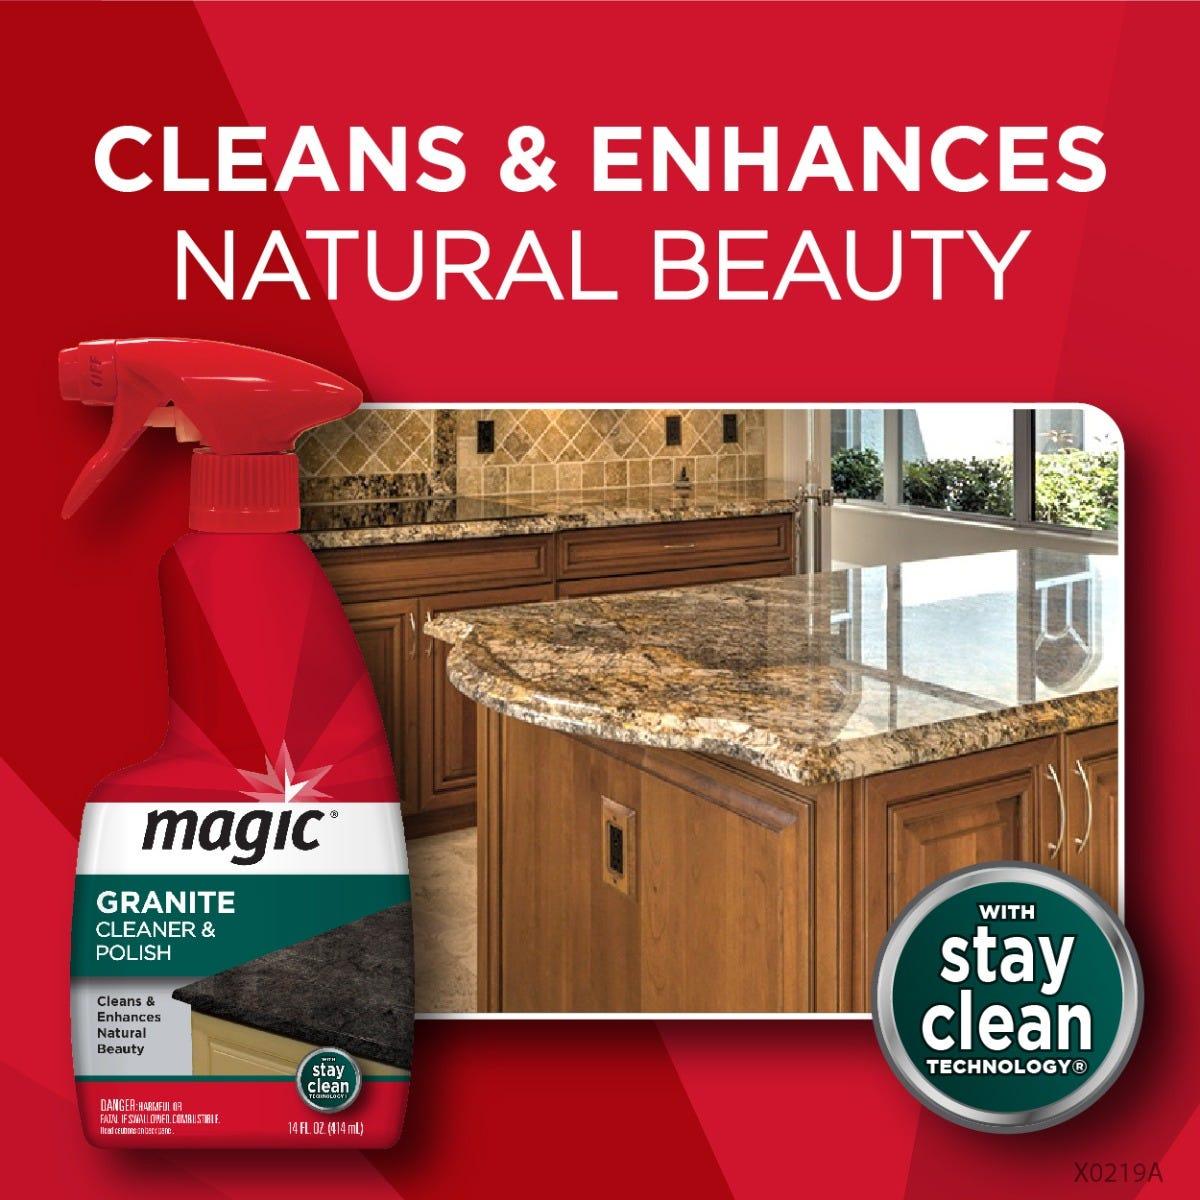 https://googone.com/media/catalog/product/m/a/magic_granite_cleaner_beauty.jpg